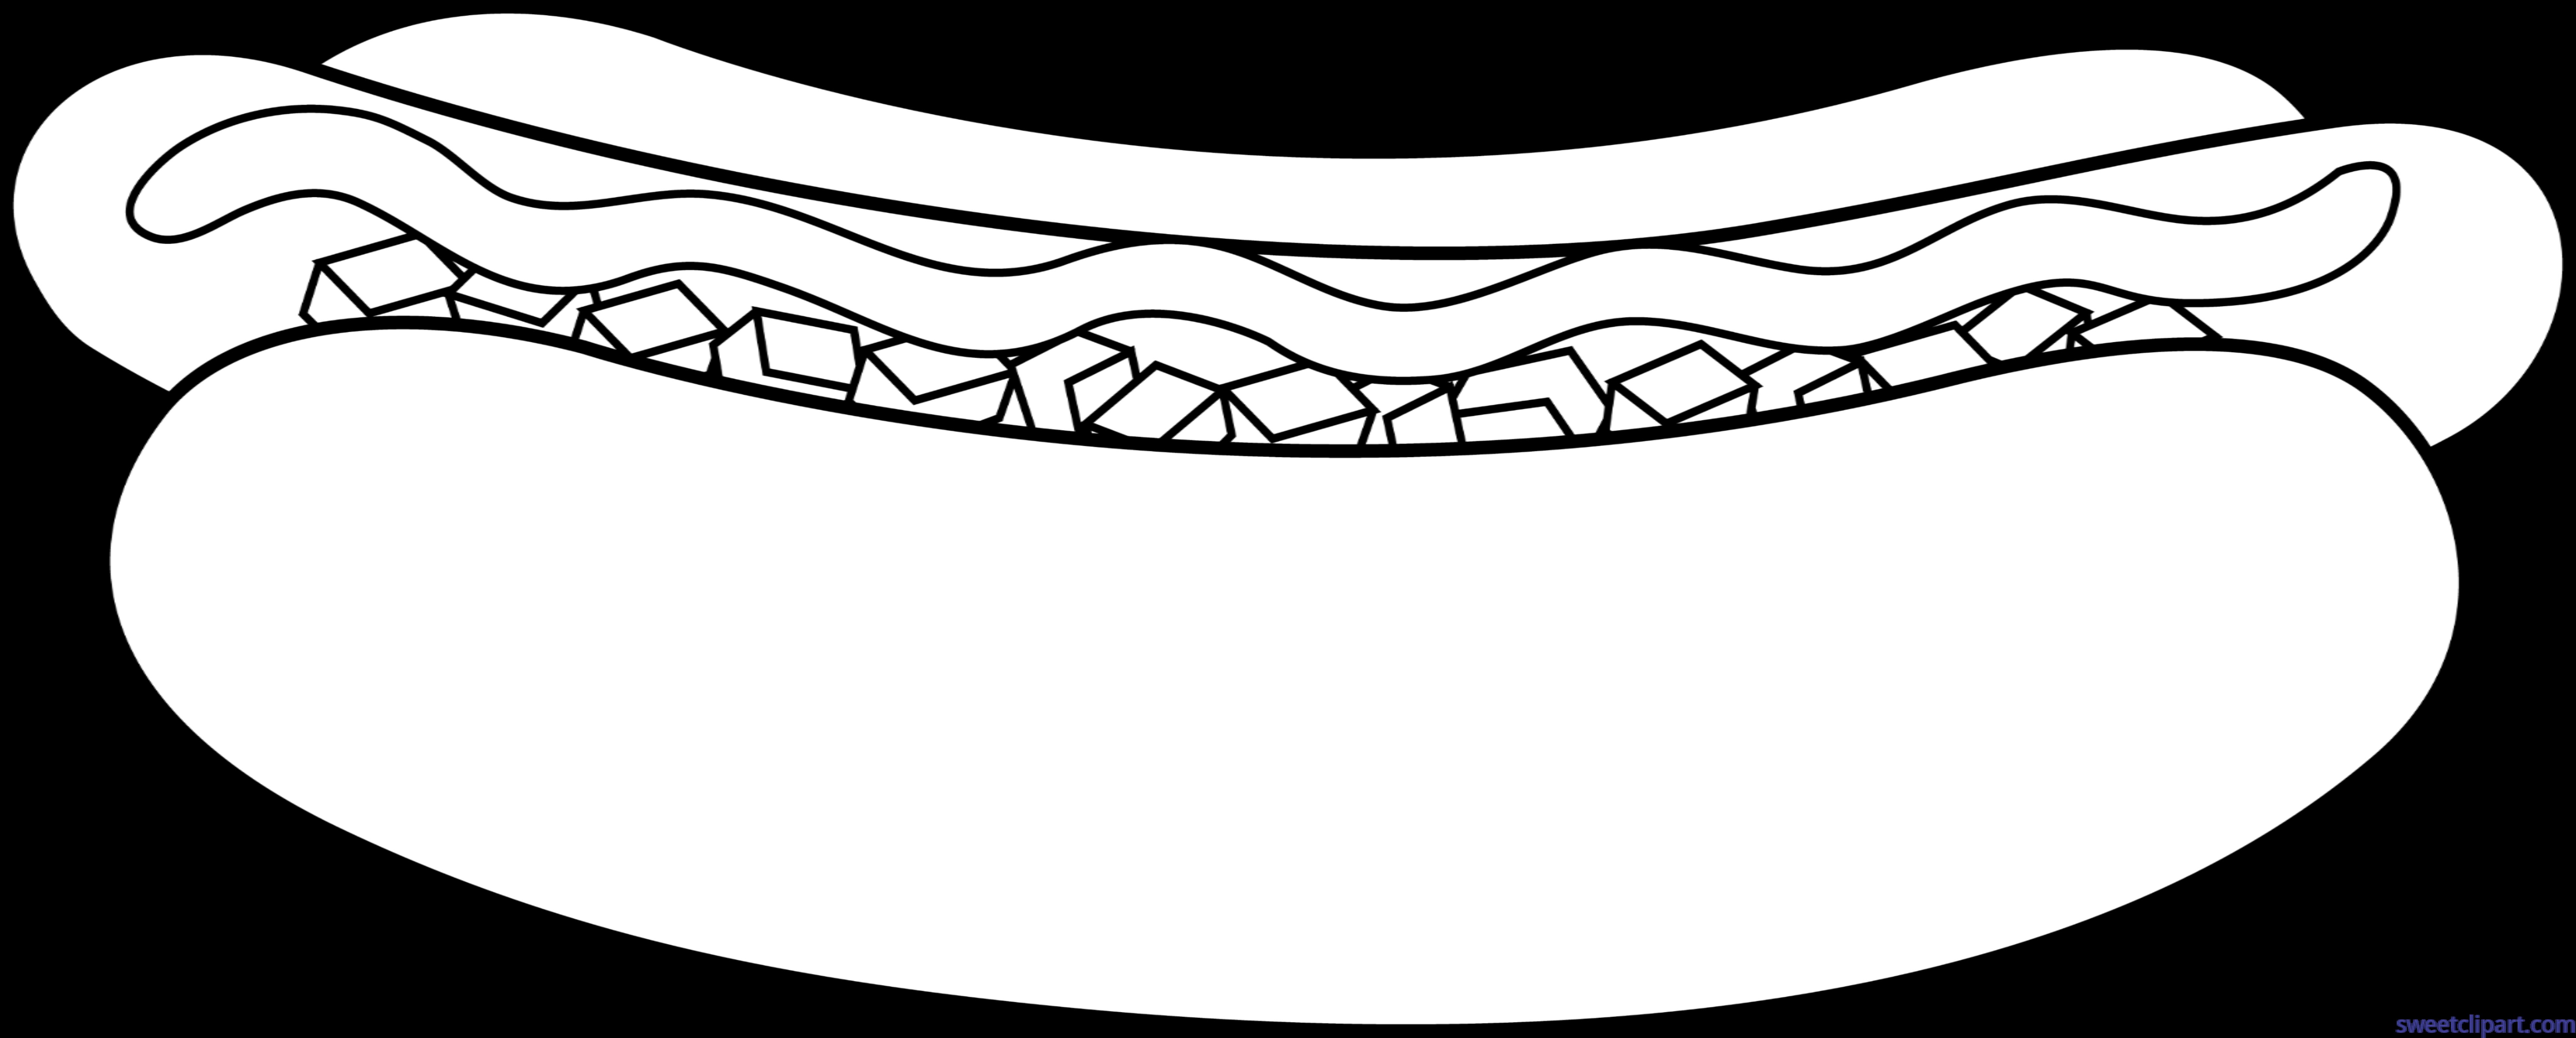 Hotdog clipart black and white. Lineart clip art sweet